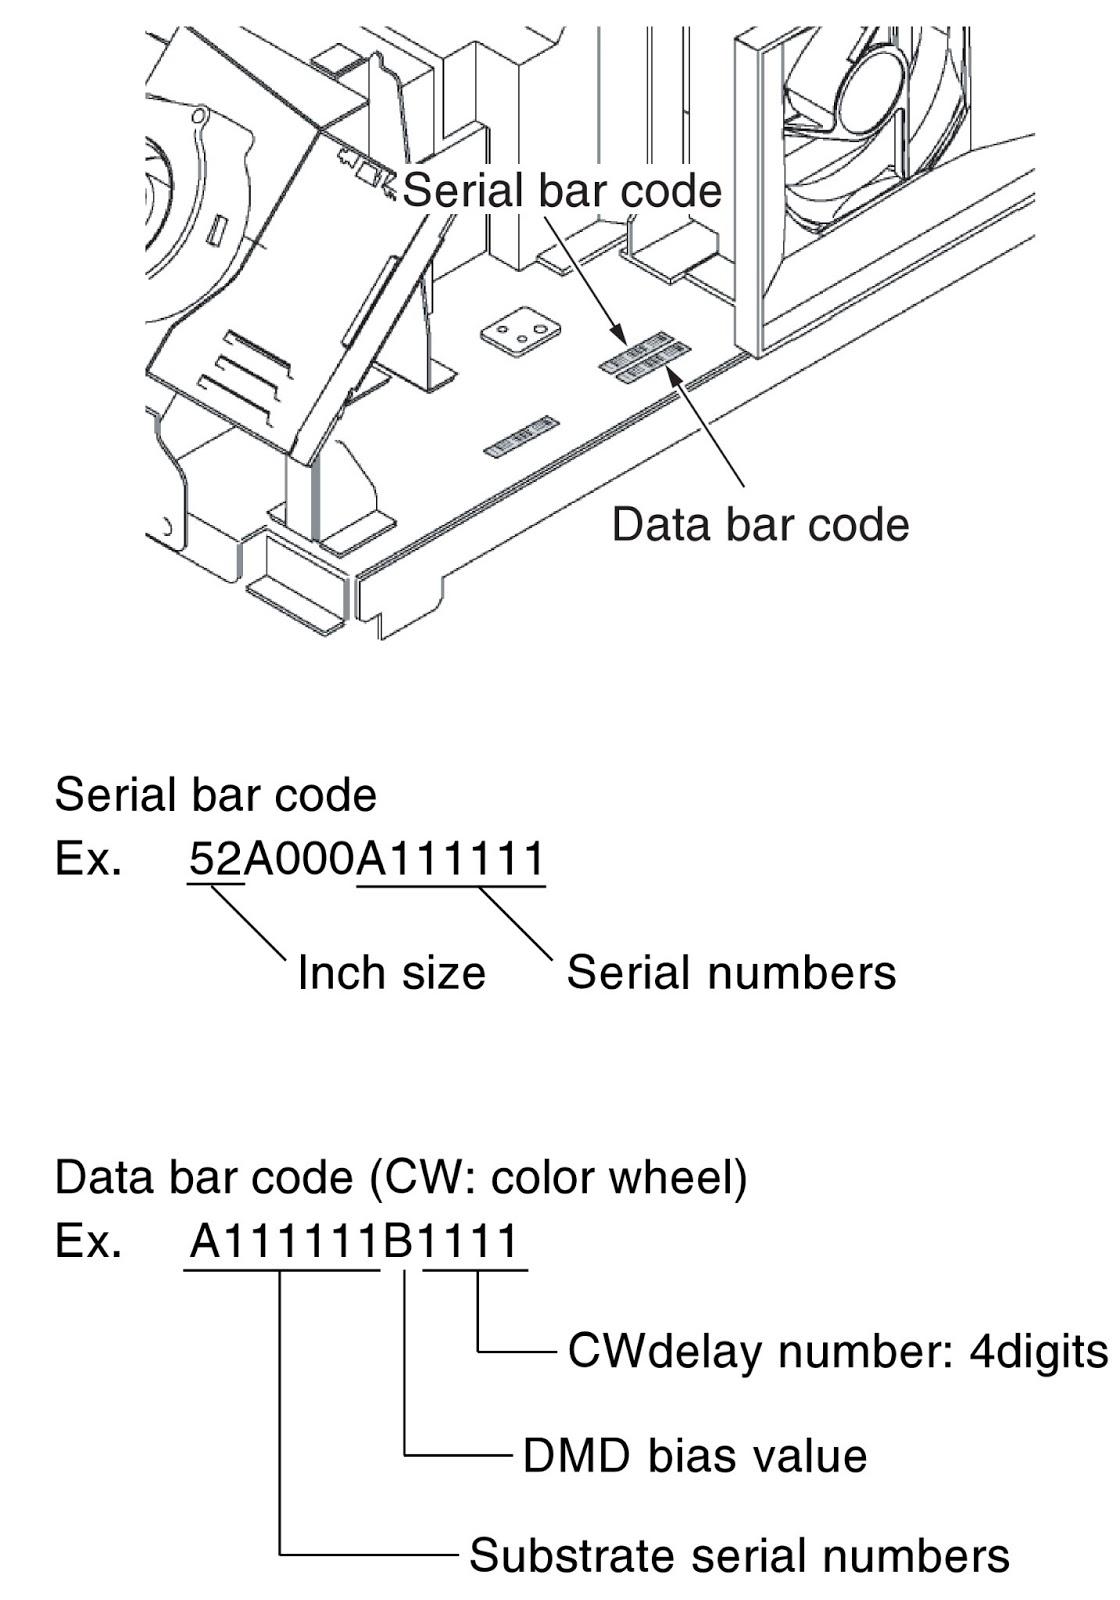 samsung dlp tv schematic get free image about wiring diagram samsung usb cable wiring diagram wiring [ 1120 x 1600 Pixel ]